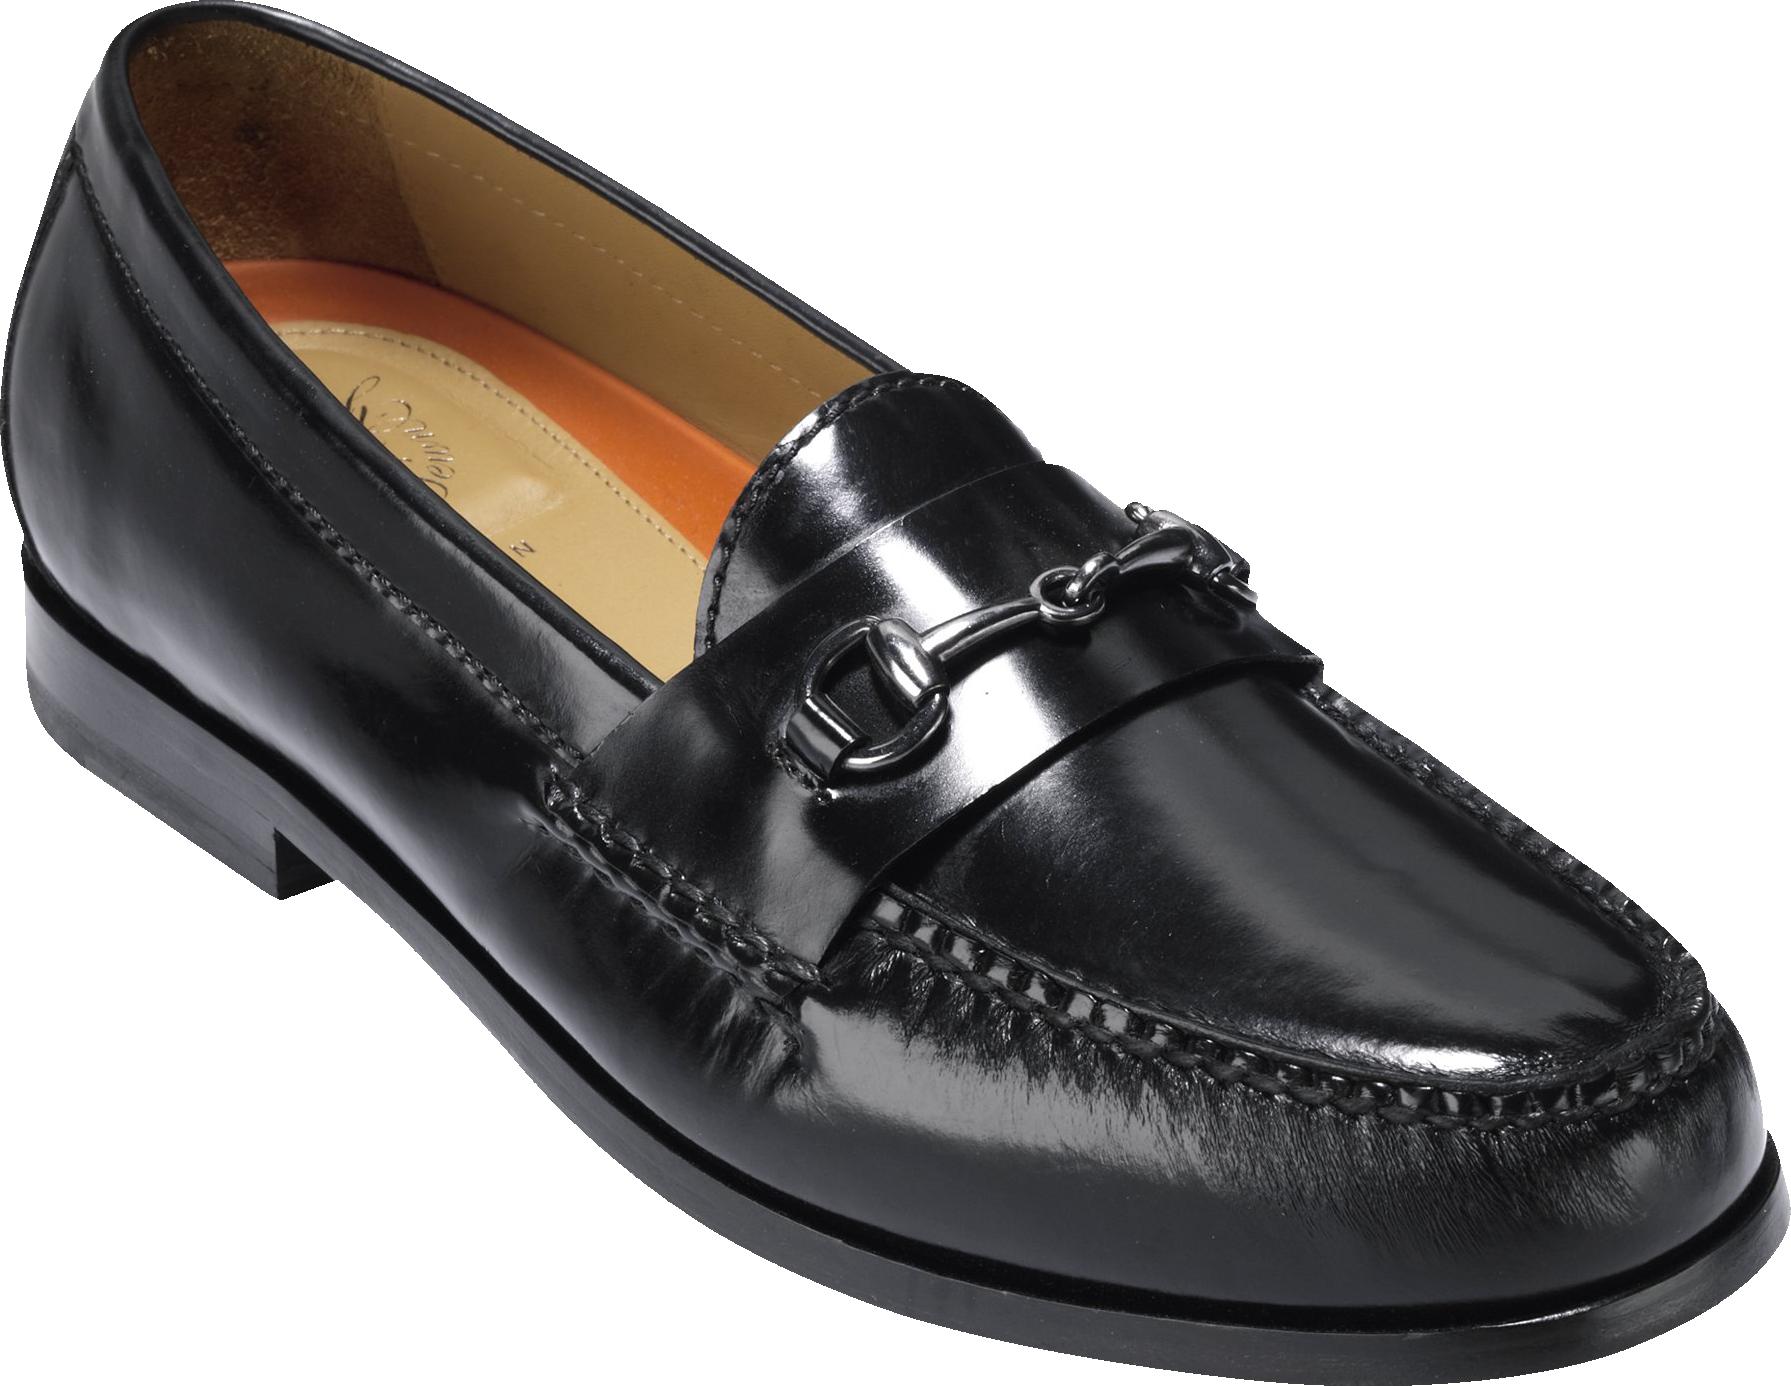 ac04b10d53 Pinch Grand Bit Shoe by Cole Haan - Cole Haan | Jos A Bank